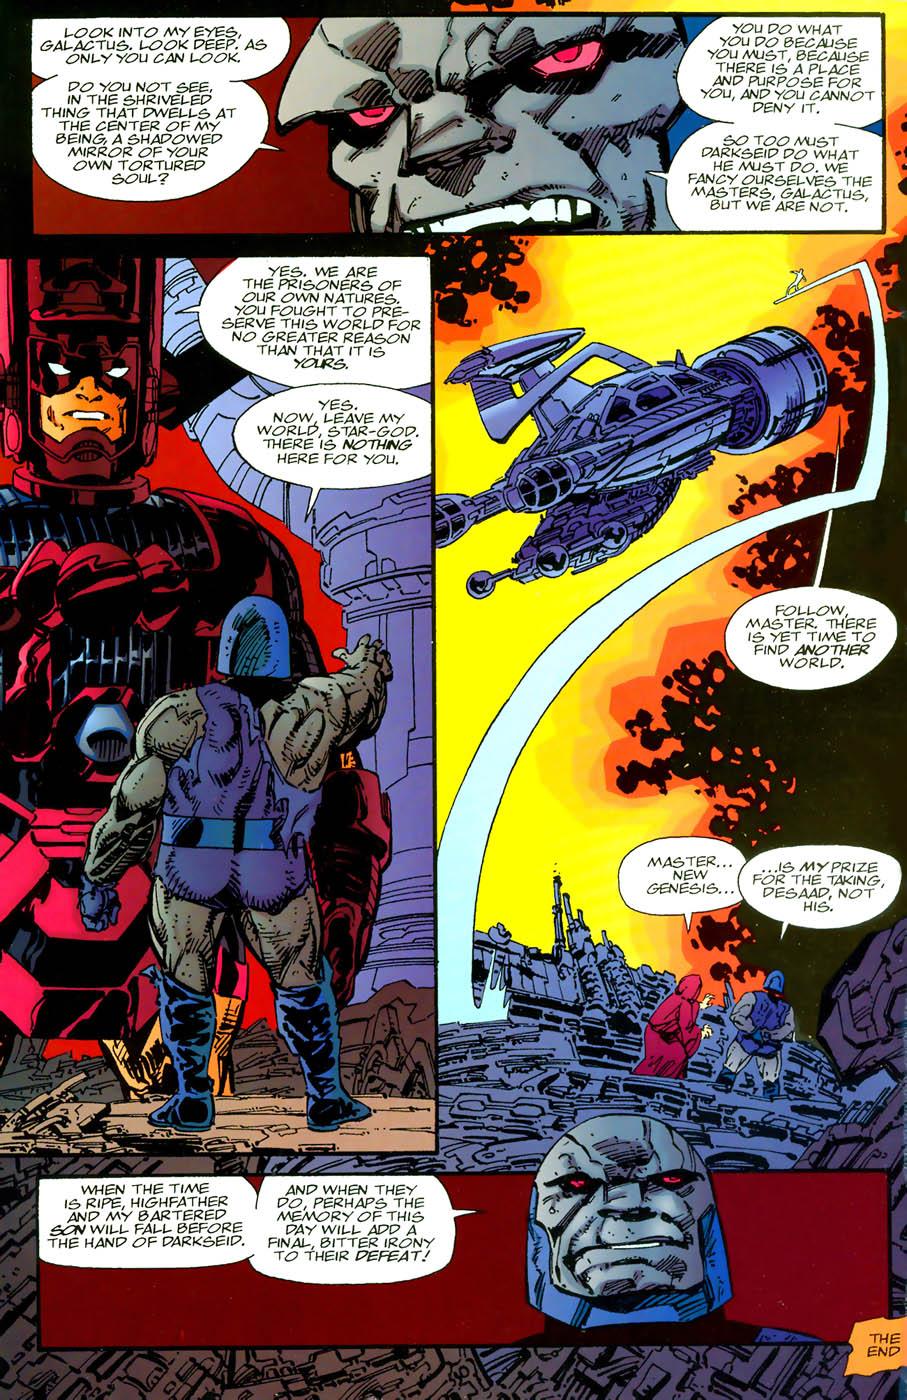 Darkseid Vs Doomsday Injustice Traffic Club